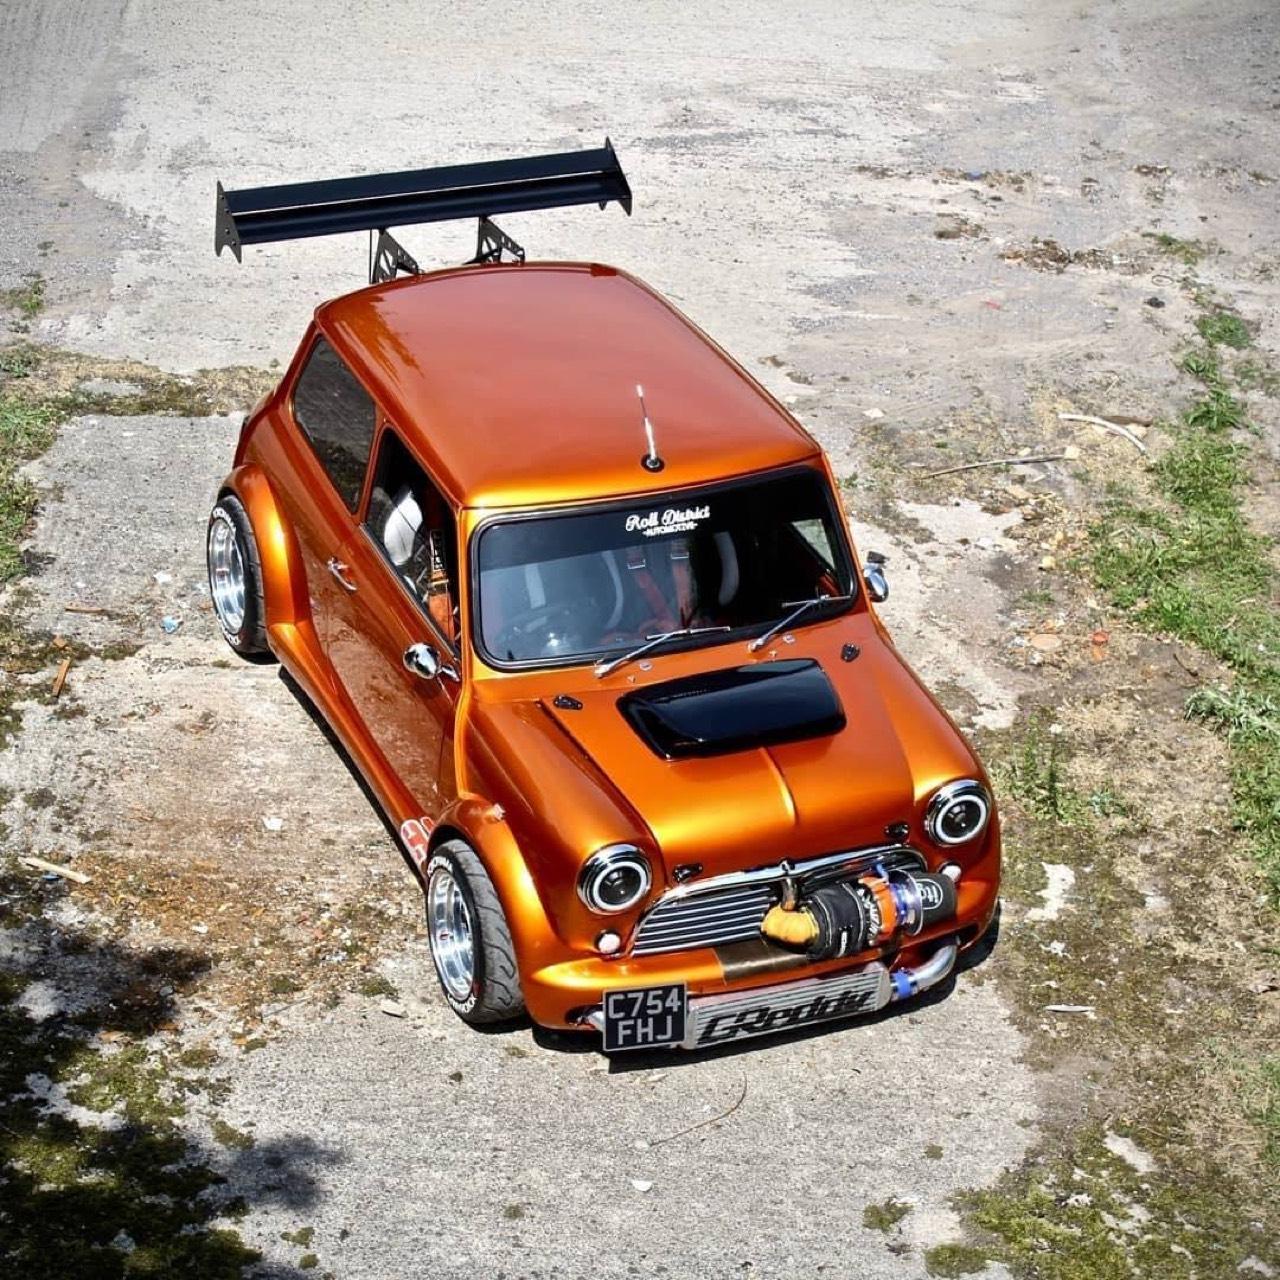 Austin Mini B16 Turbo... Shootée aux hormones ! 5